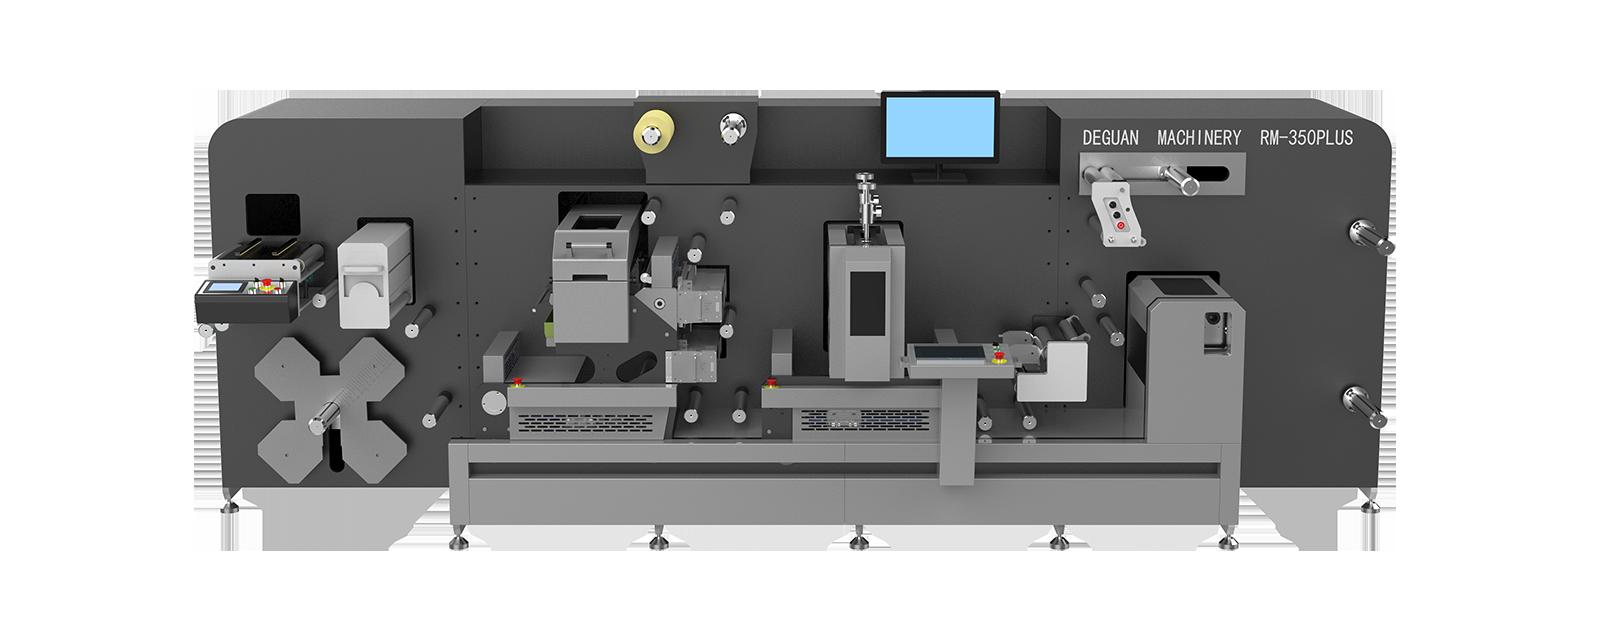 Modular machine batch printing die - cutting